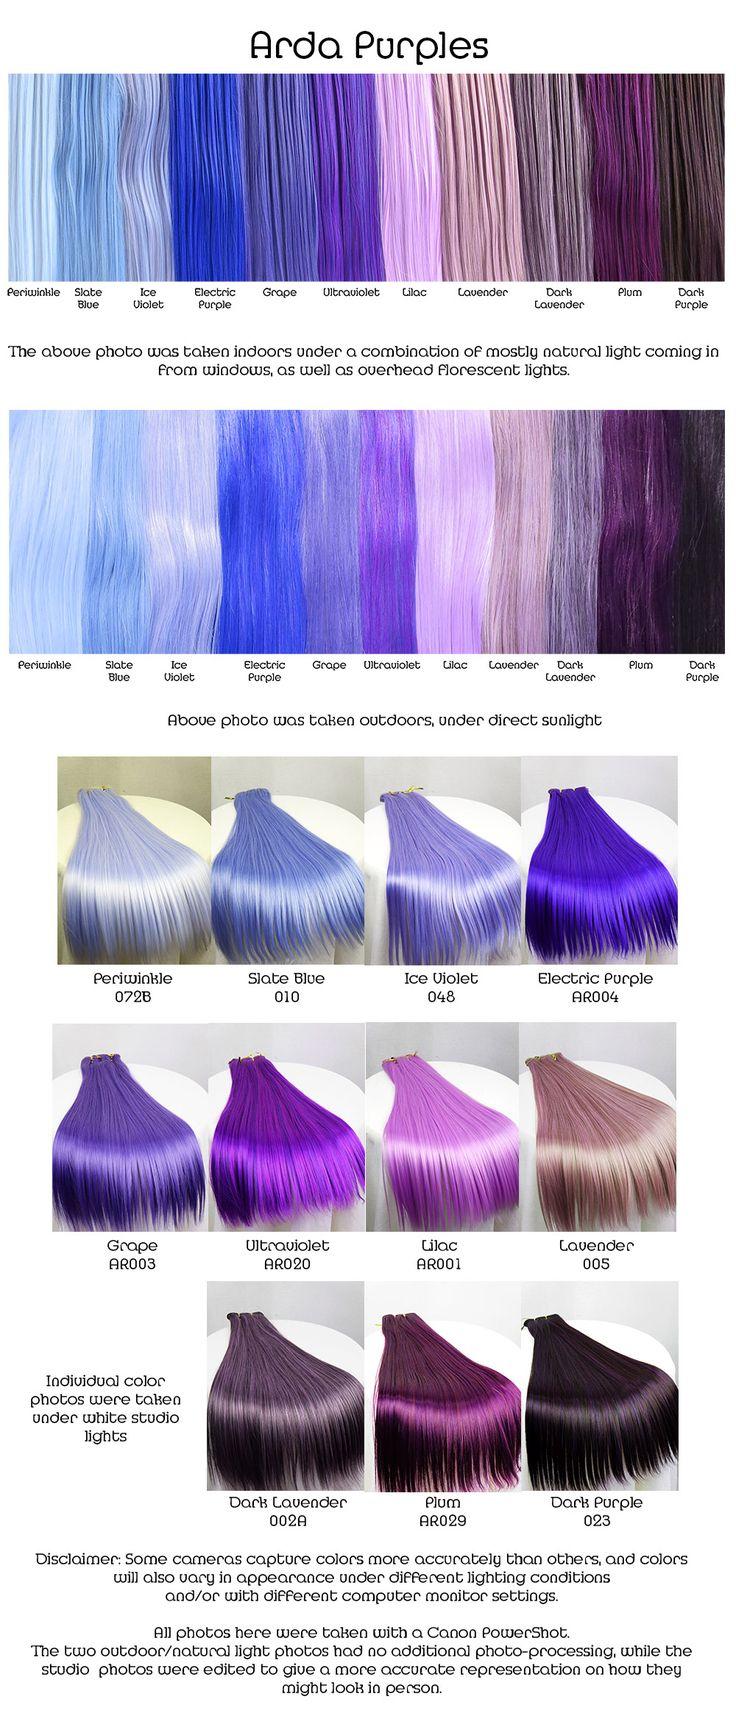 I Like Electric Purple Ultraviolet Lilac And Plum